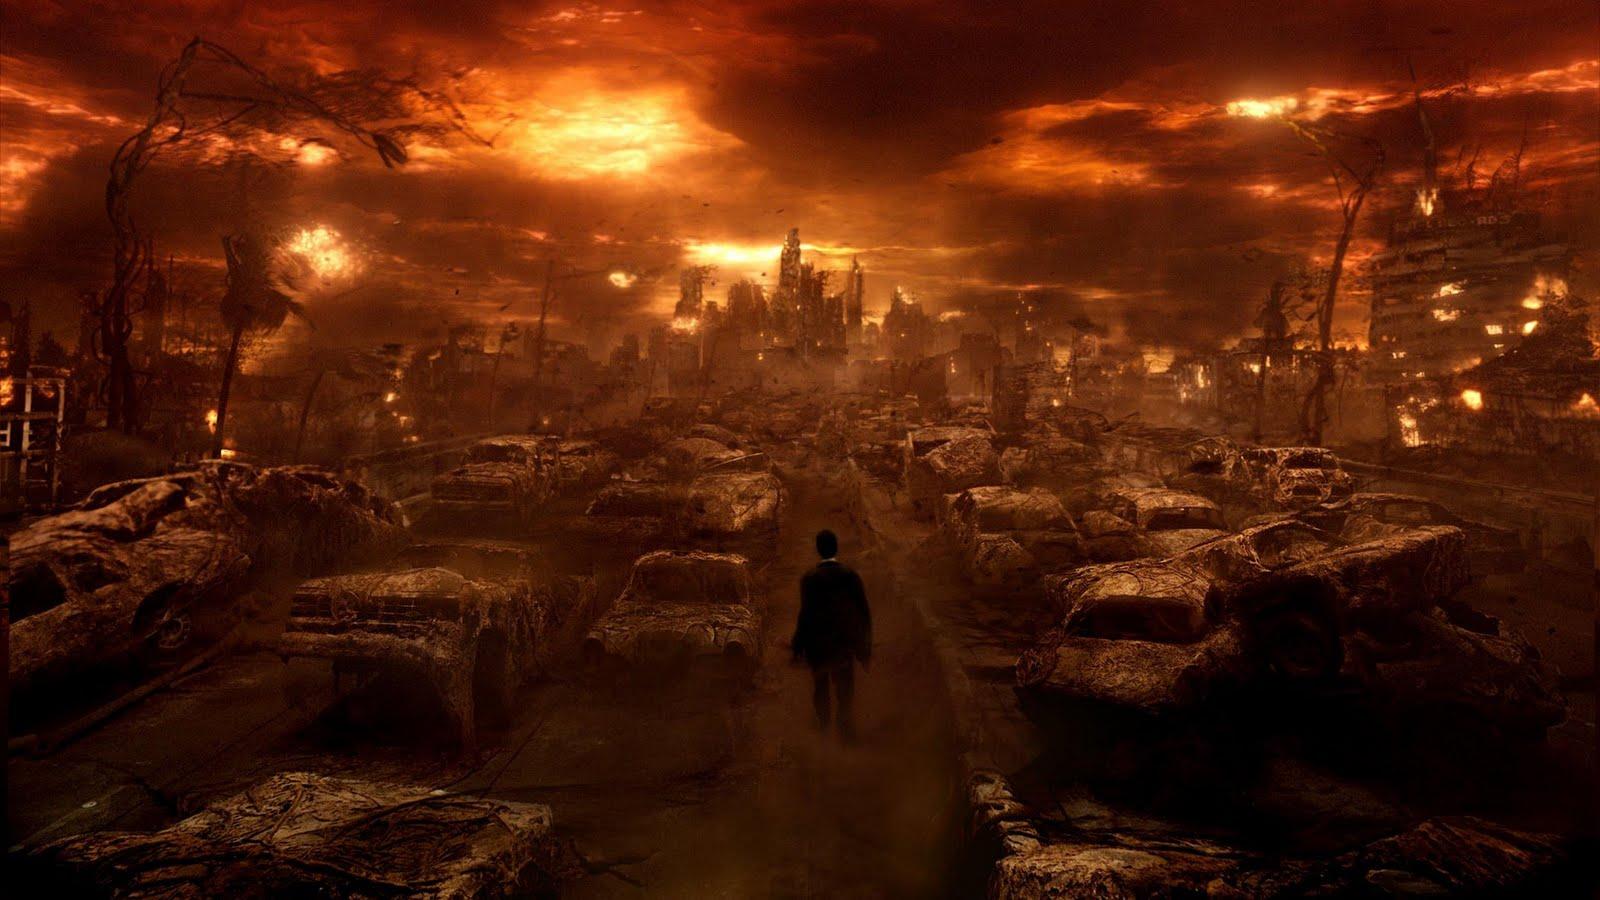 Mesmo Que Eu Ande Pelo Vale Da Sombra Da Morte Salmo: We All Have Scars, We All Have Stories.: Mesmo Que Eu Ande